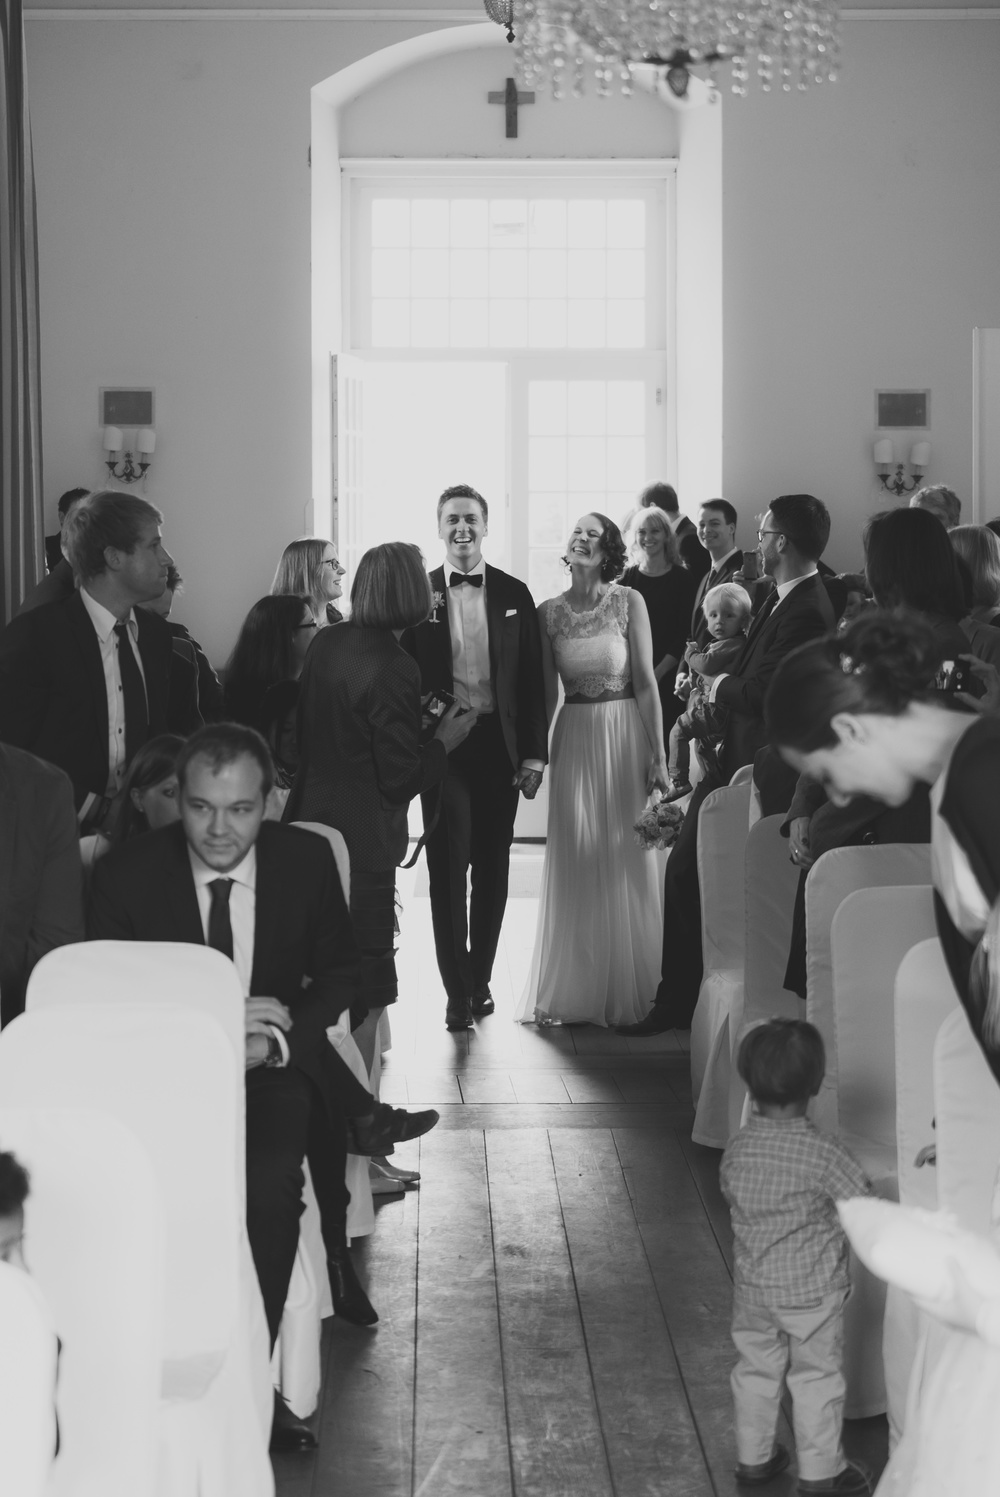 Hochzeitsfotograf-Schlossruine-Hertefeld-Weeze-063.jpg